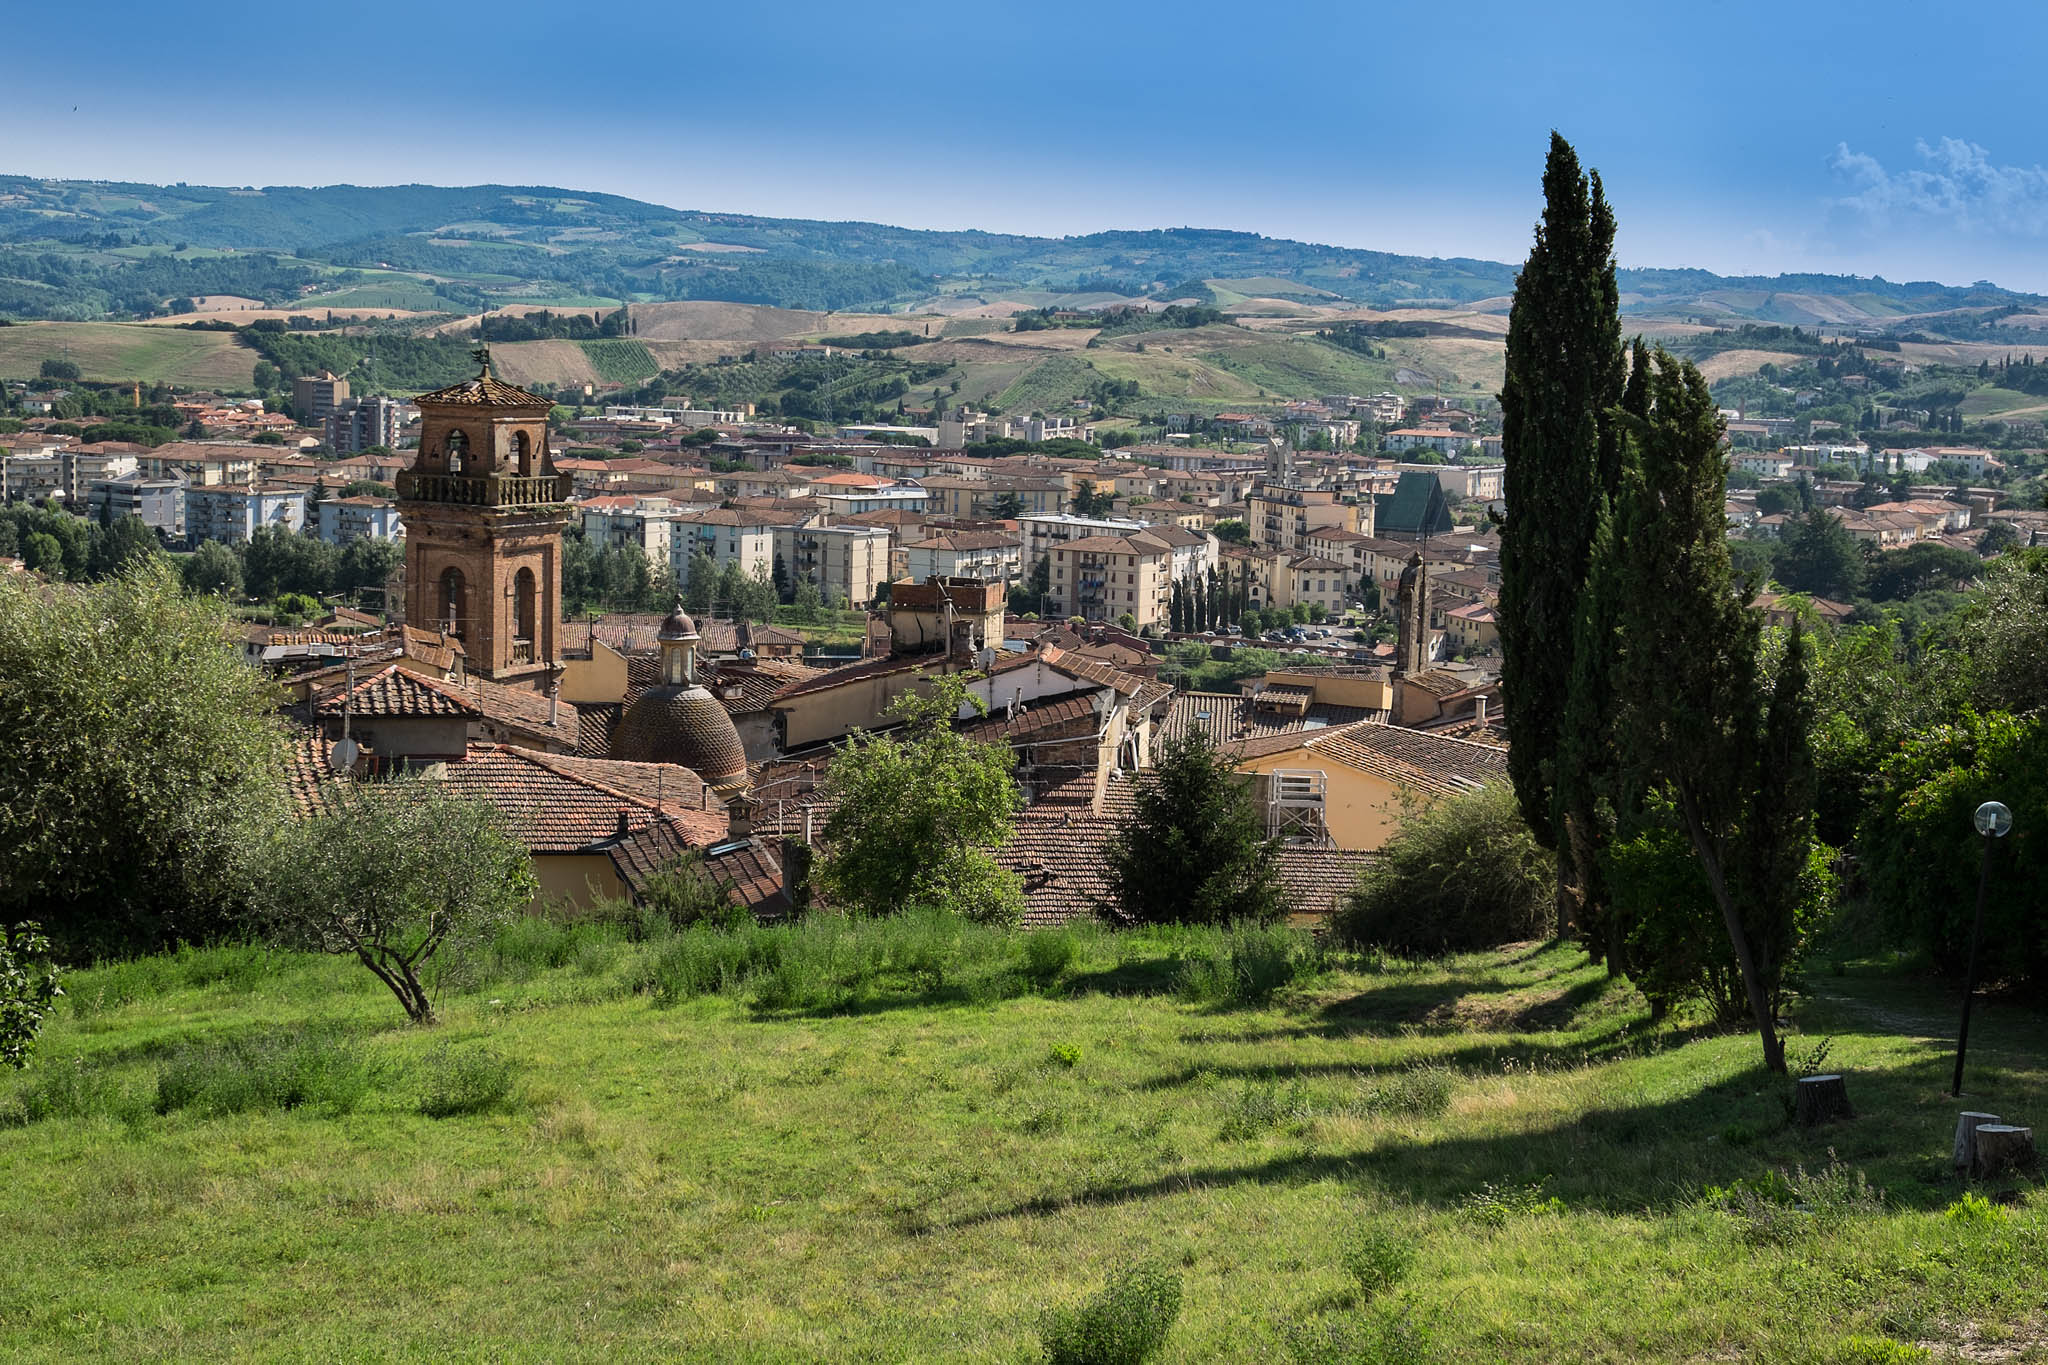 Castel-Fiorentino